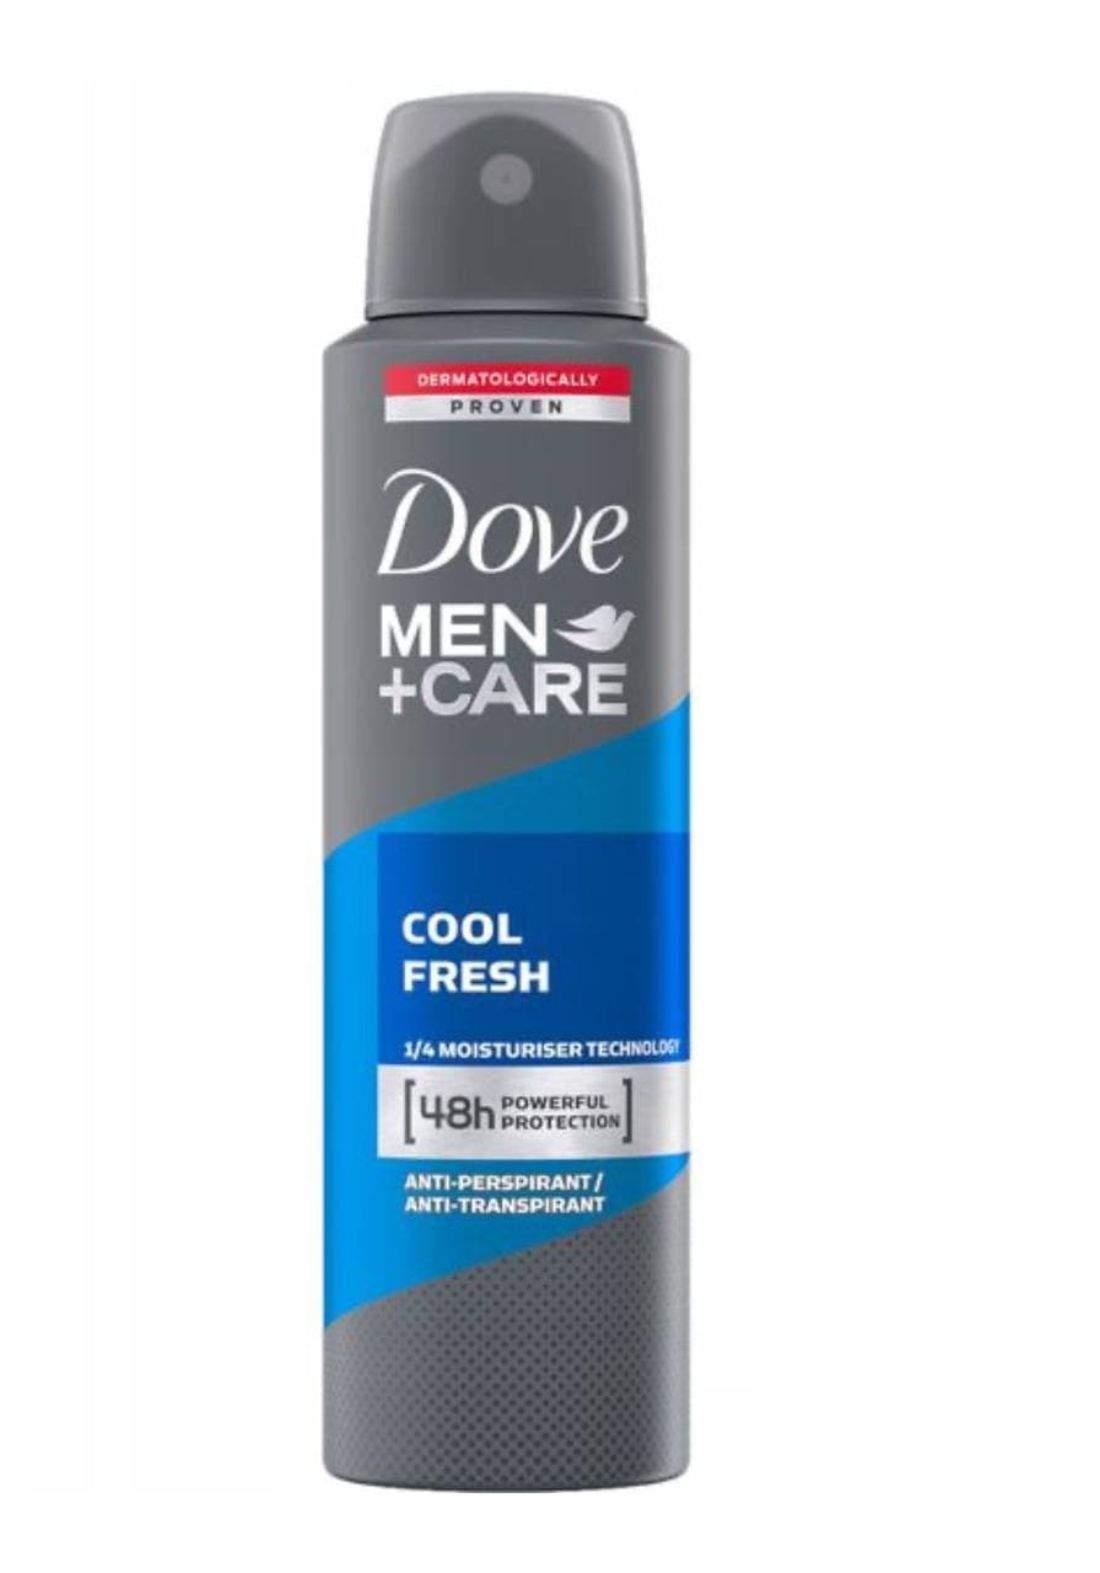 Dove men care ant-perspirant 250ml دوف مصاد تعرق